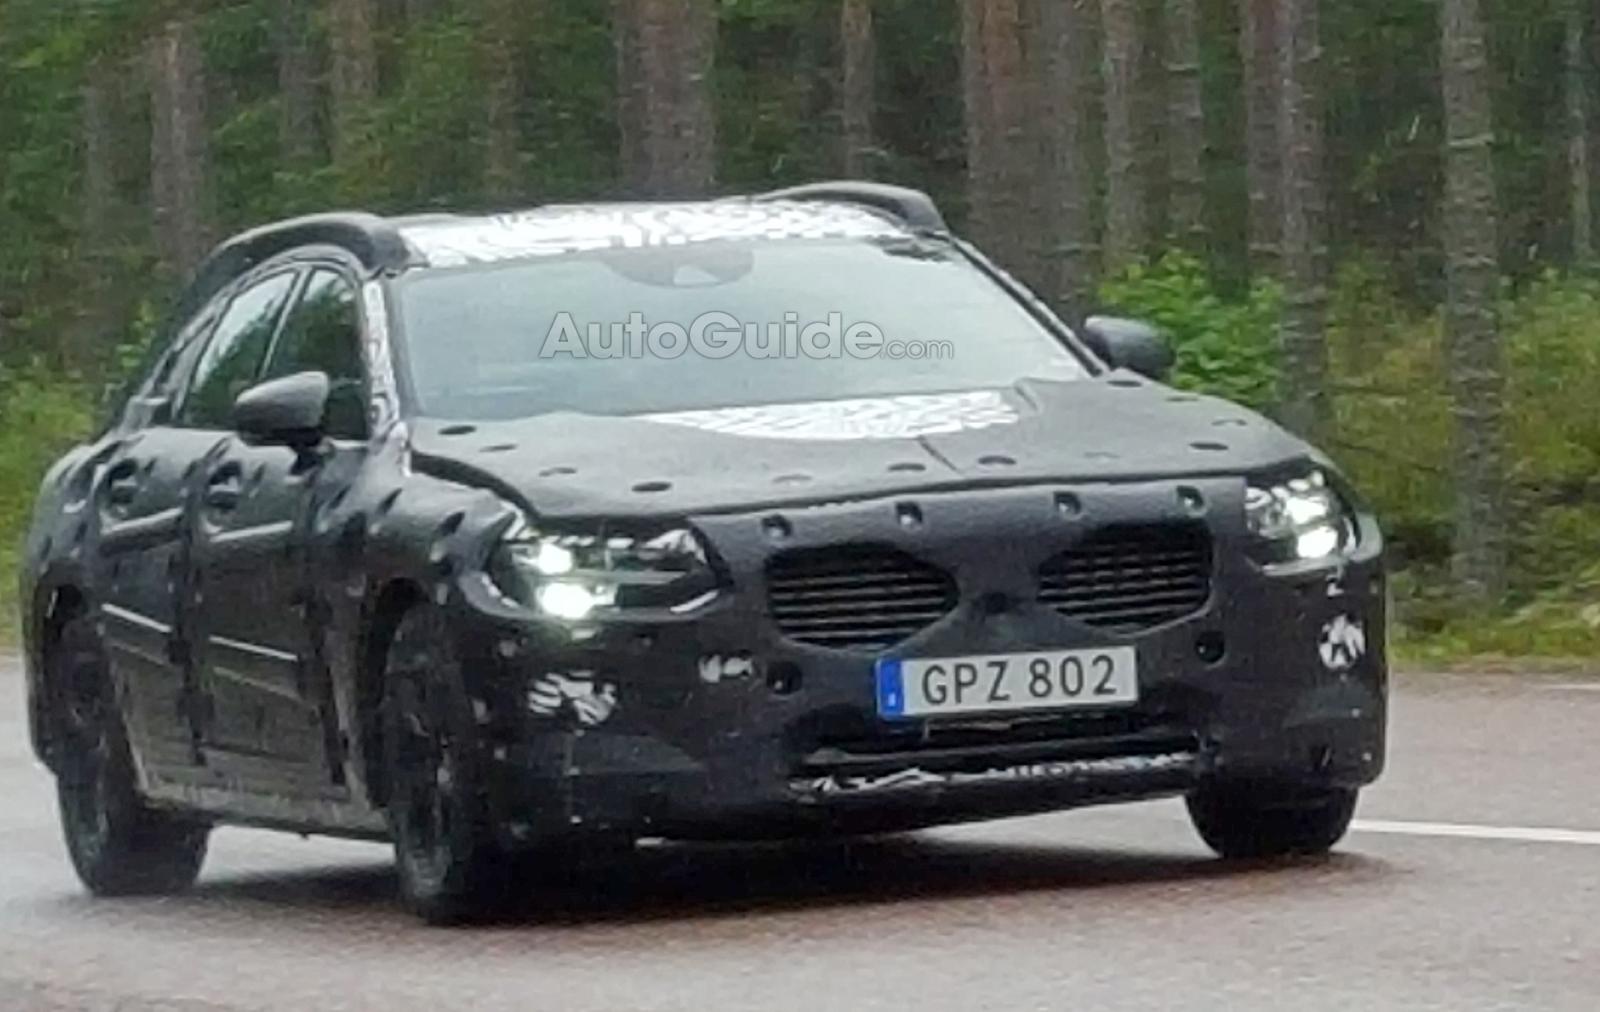 Каким будет новый Volvo S90?